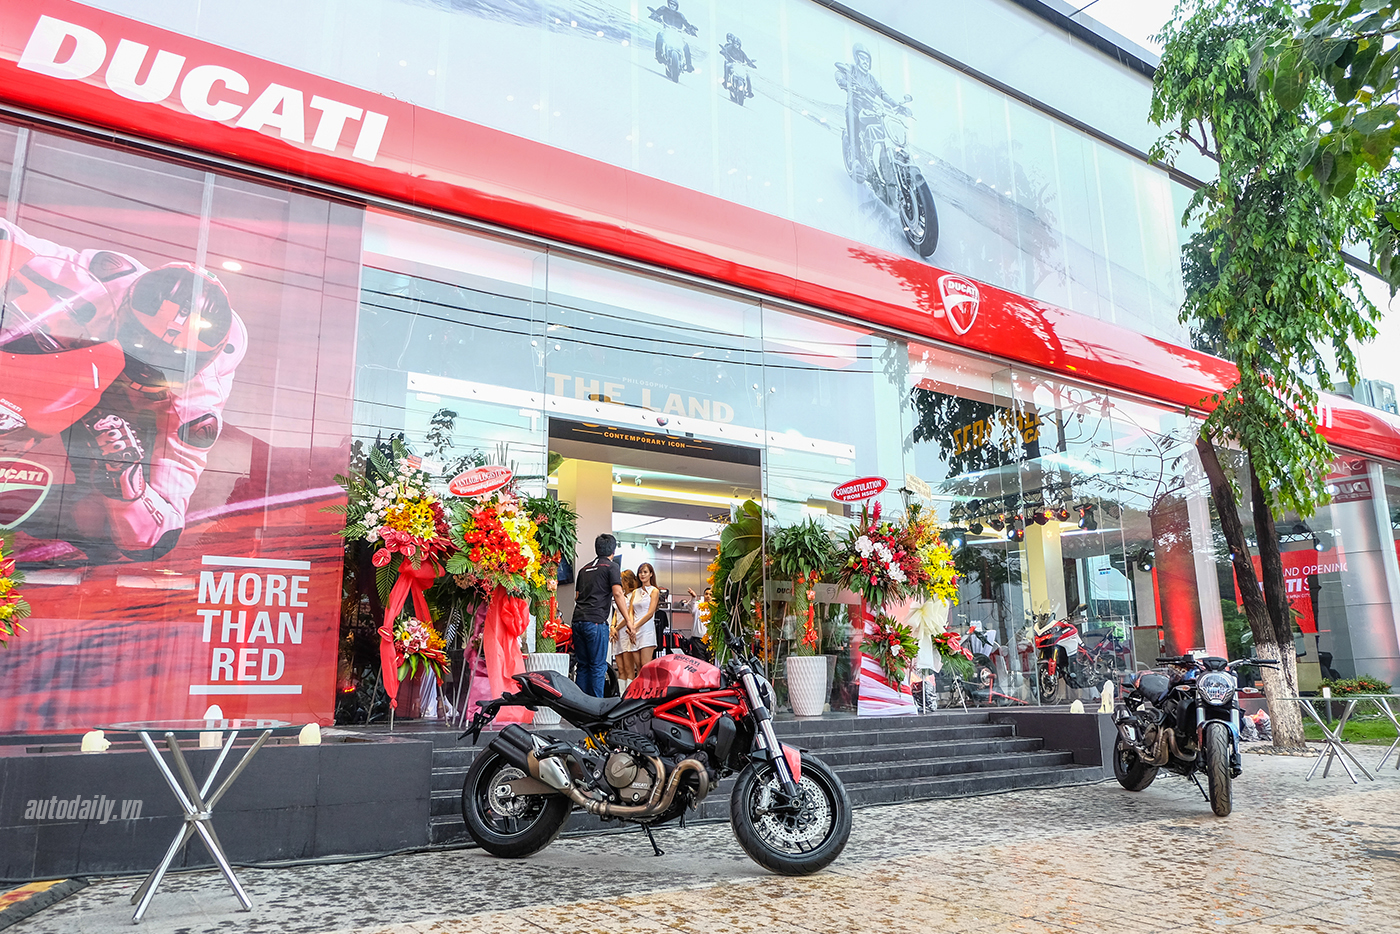 ducati-vietnam-1.jpg